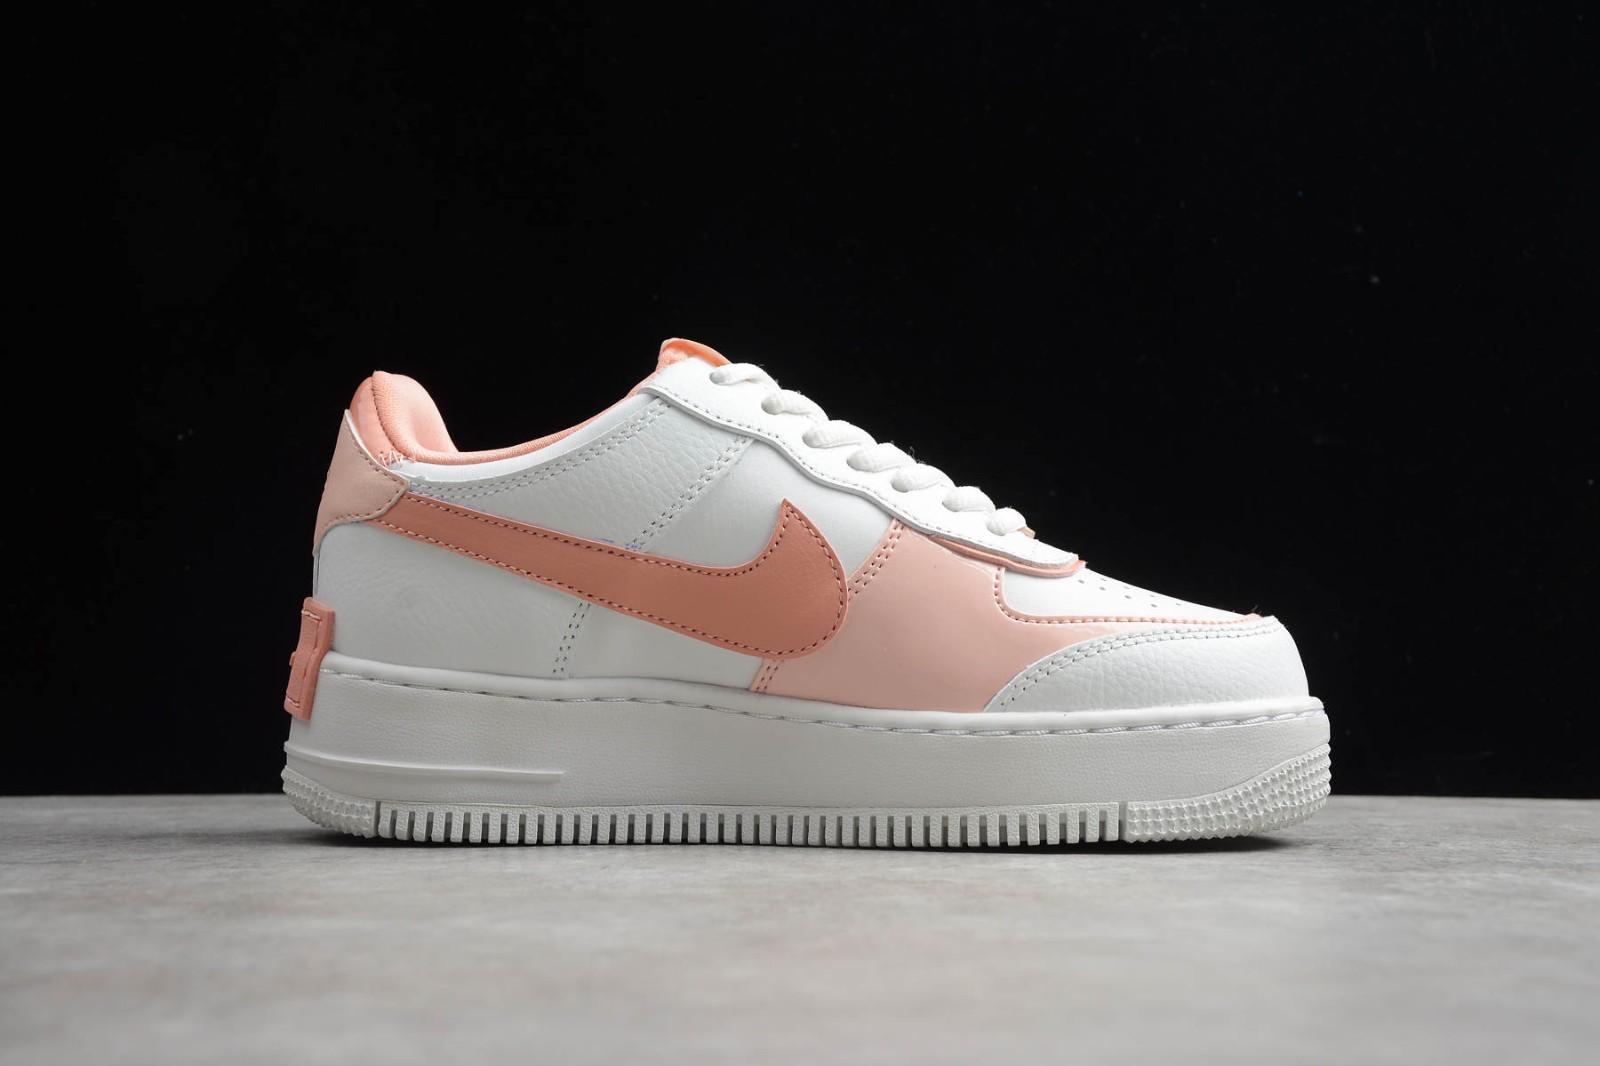 Nike Air Force 1 Shadow Summit White Pink Quartz Af1 Low Casual Shoes Cj1641 101 Reactrun Nike air force 1 af1 w shadow quartz pink blush peach uk 2 3 4 5 6 7 8 9 us newtop rated seller. nike air force 1 shadow summit white